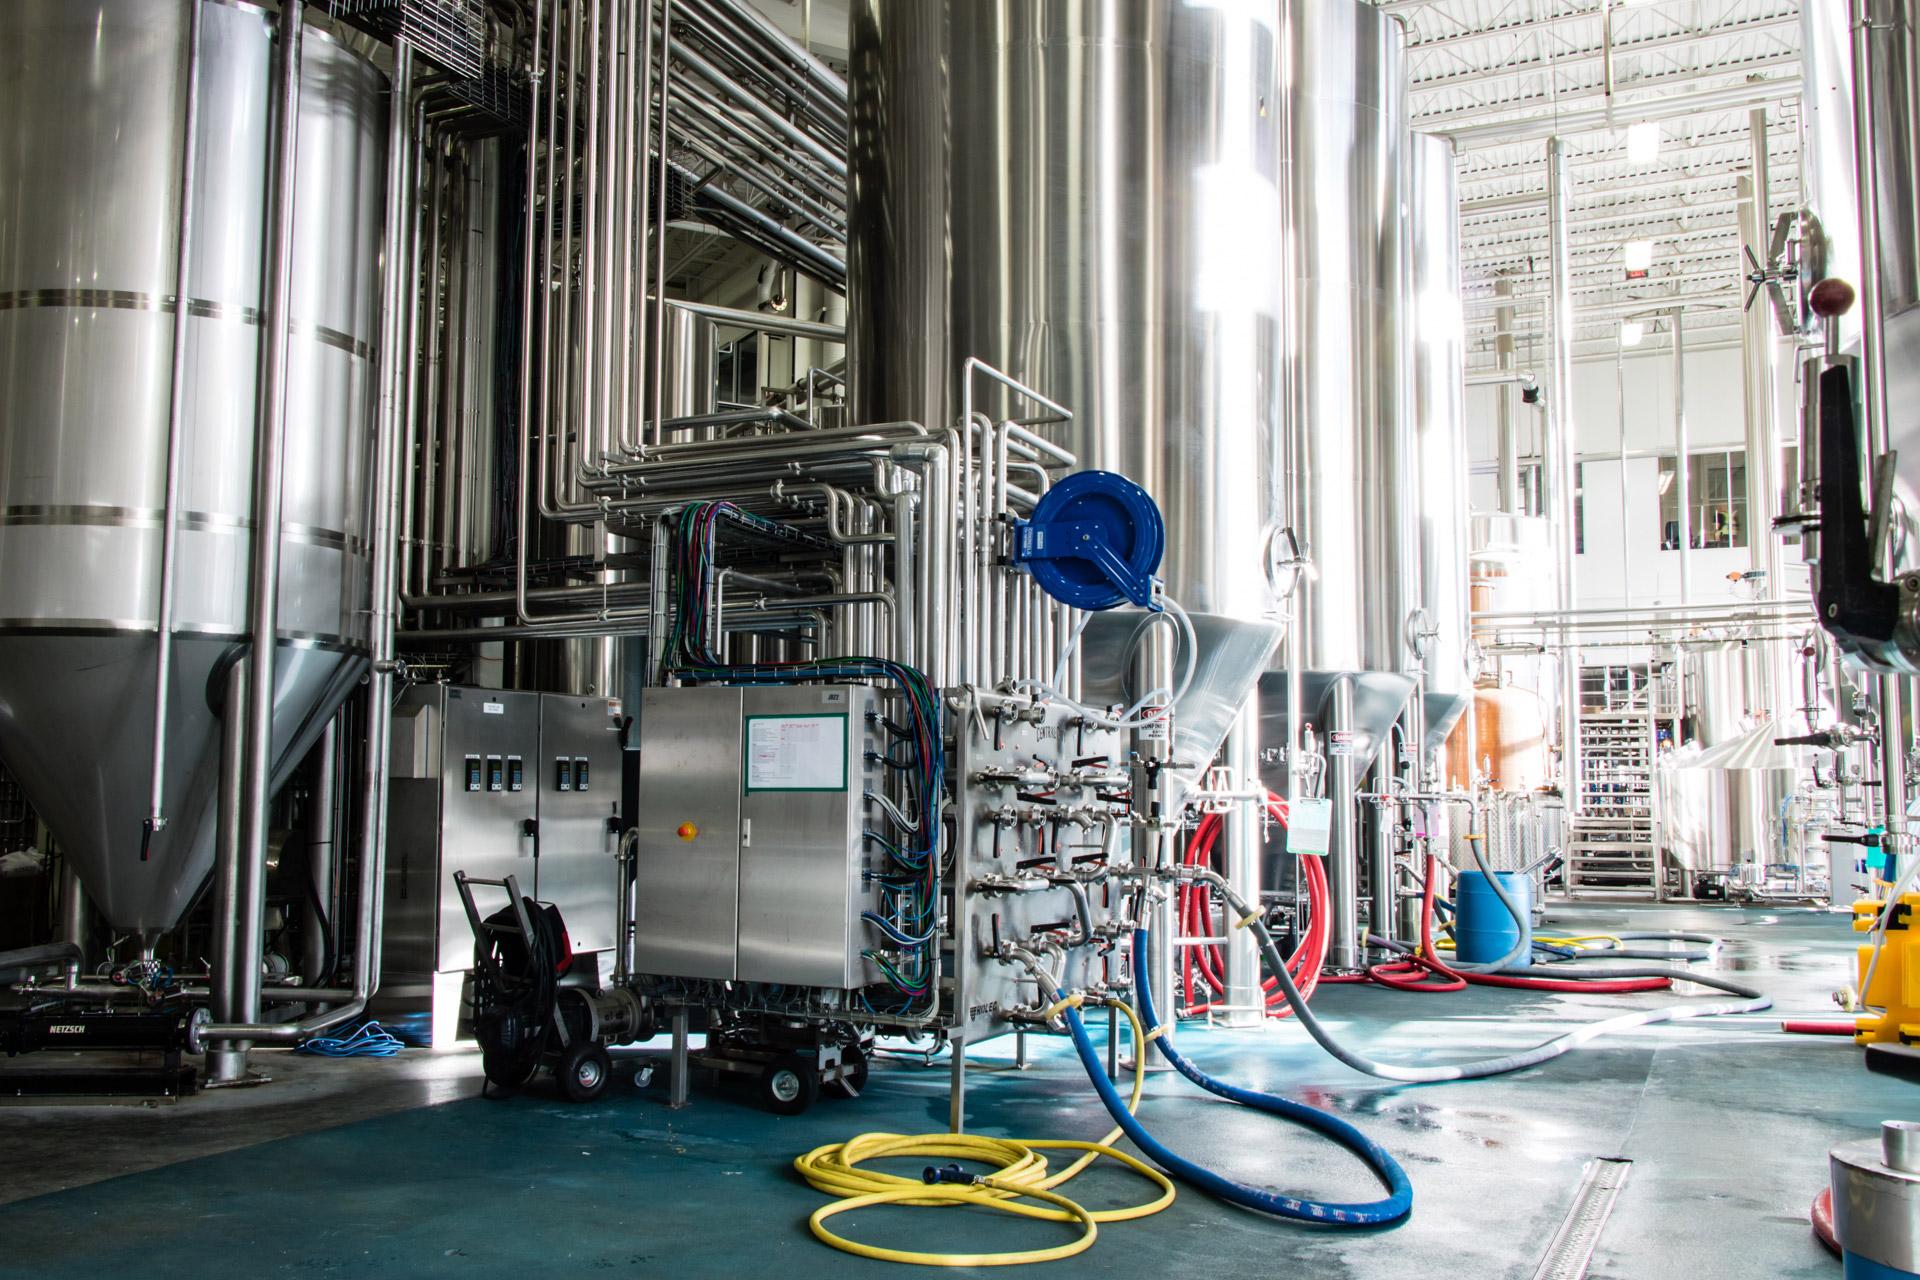 Bridgeview Brewing Company Contract Brewing Equipment Slider